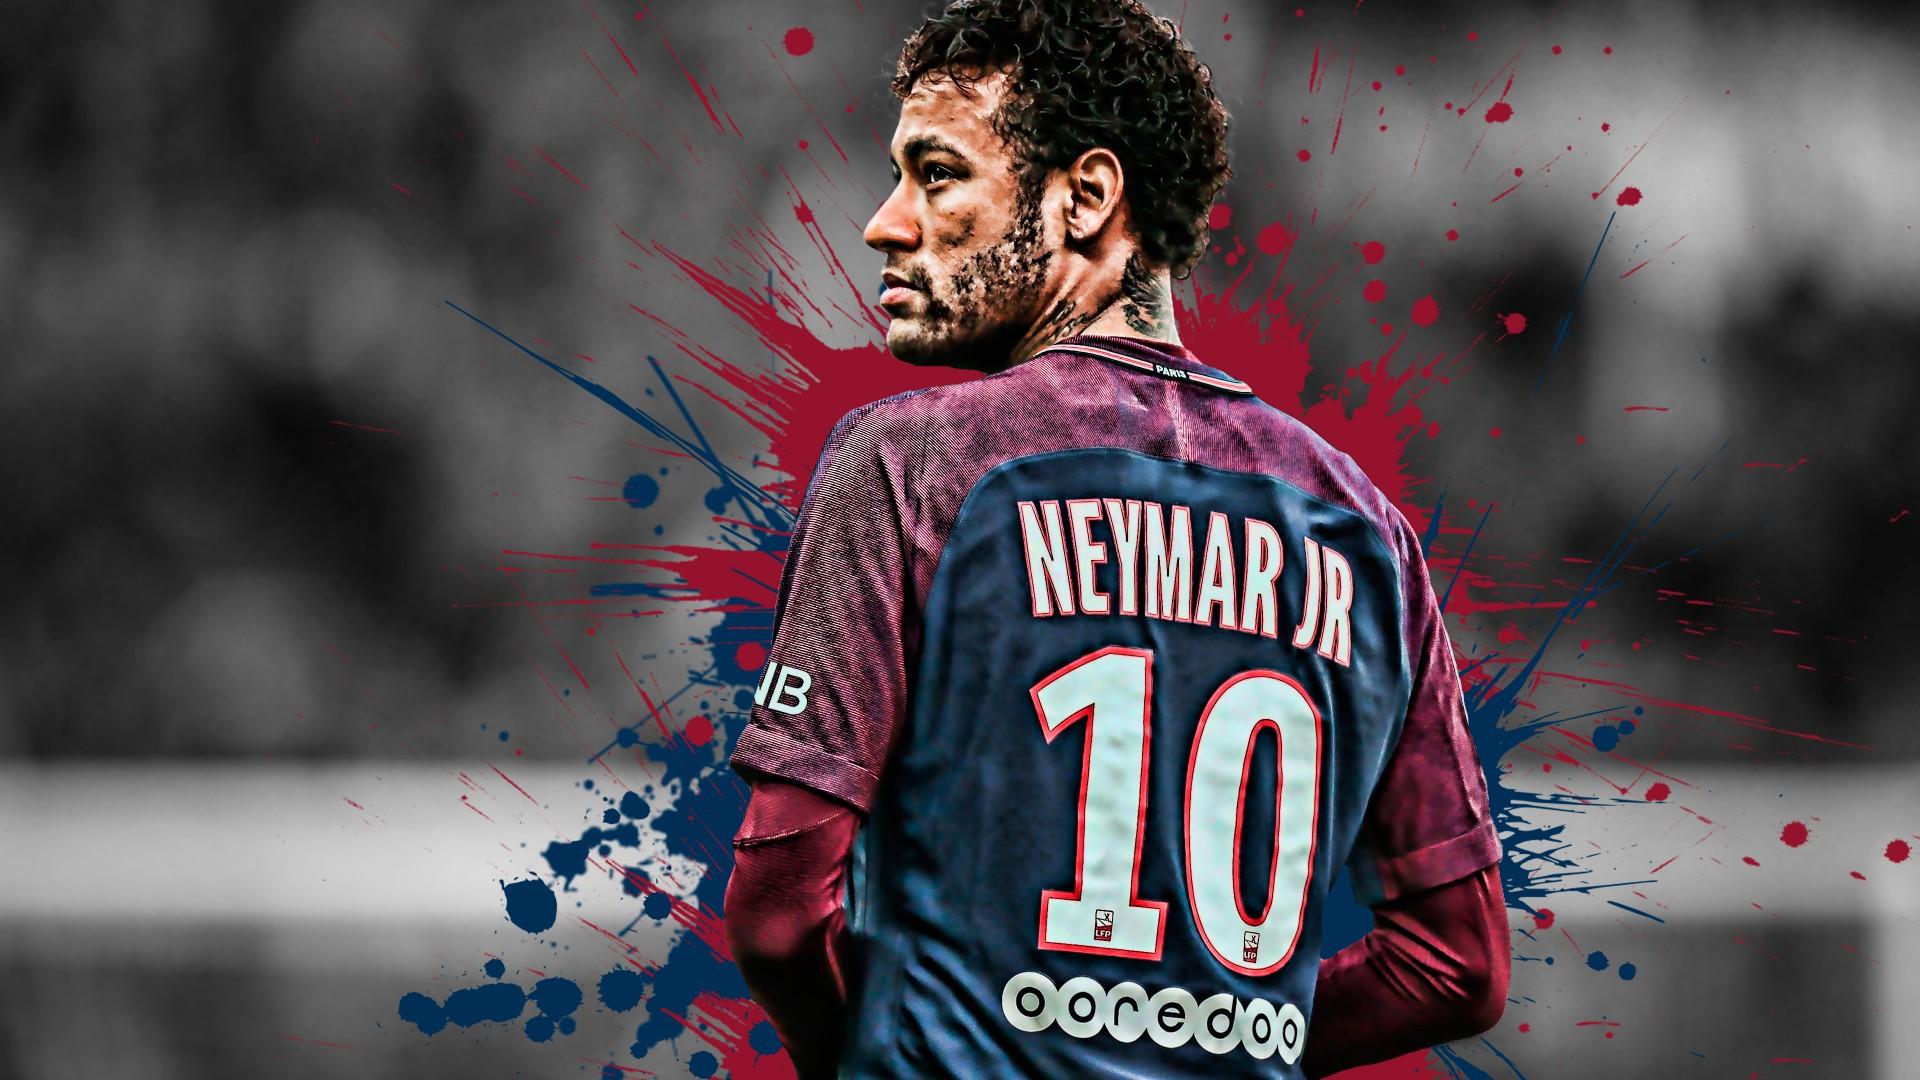 Full Hd Cute Love Wallpaper Neymar Brazilian Football Player 4k Wallpapers Hd